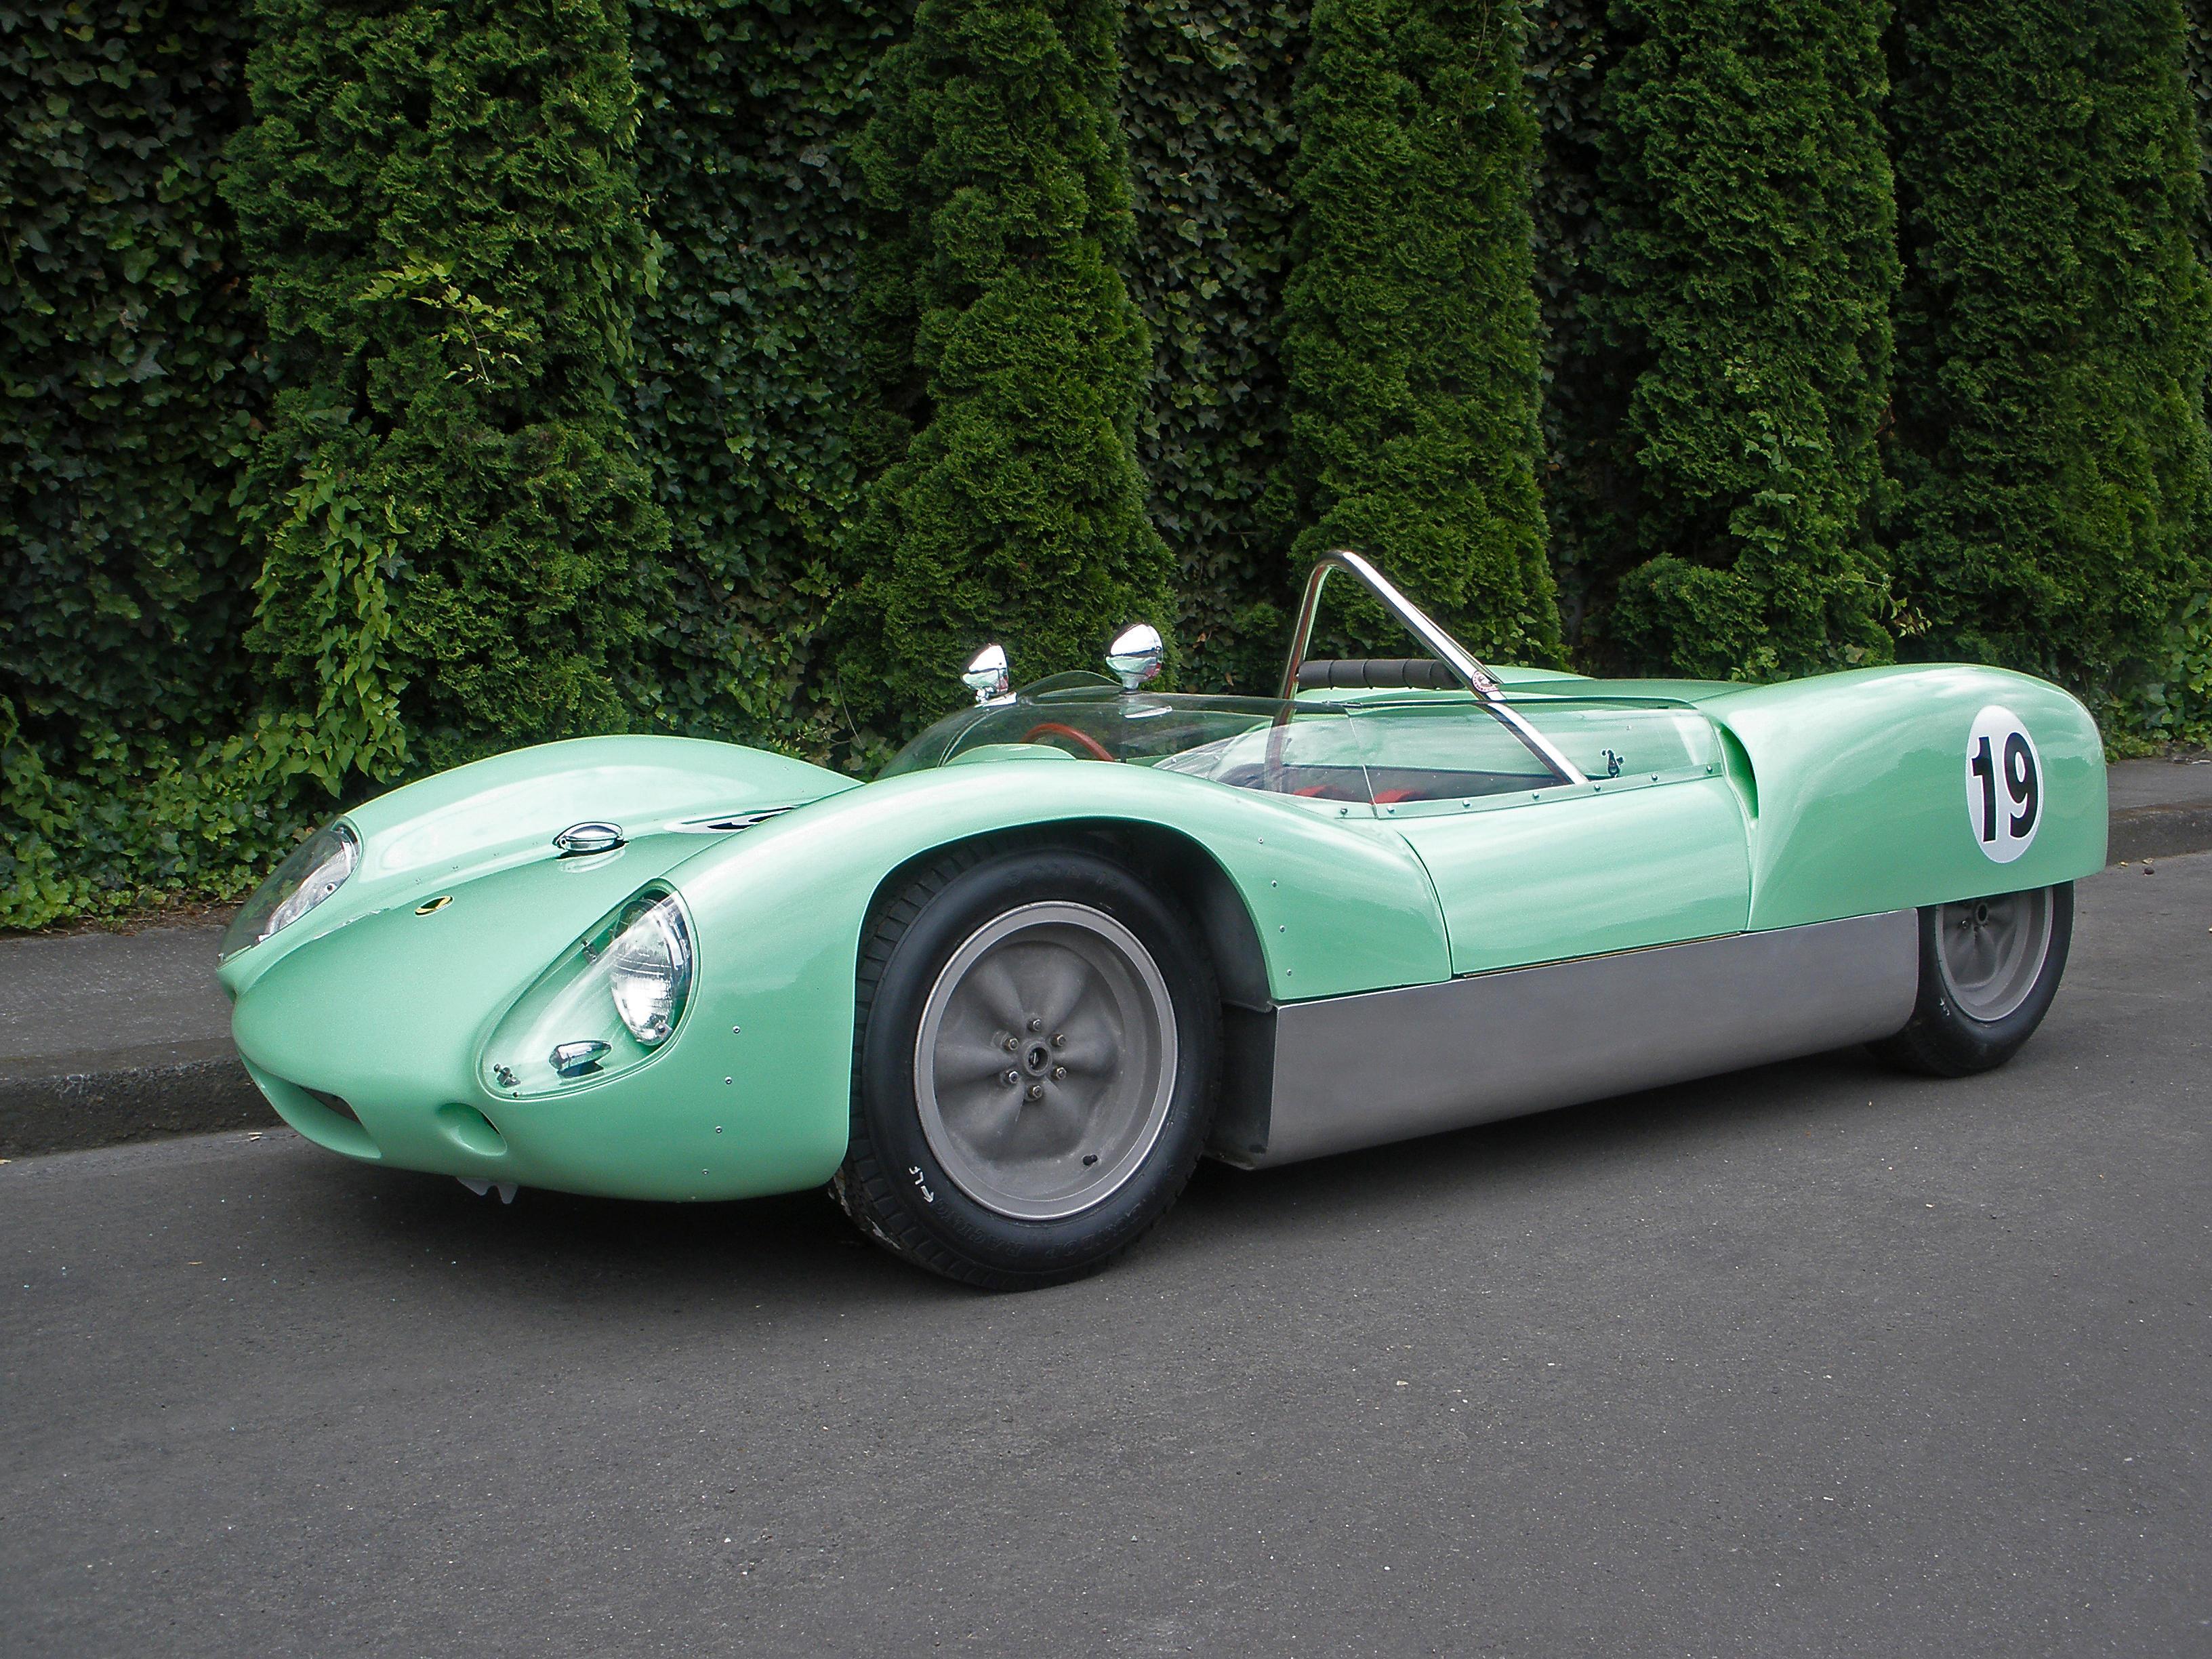 1961 Lotus Type 19 Sports-Racing Two-Seater